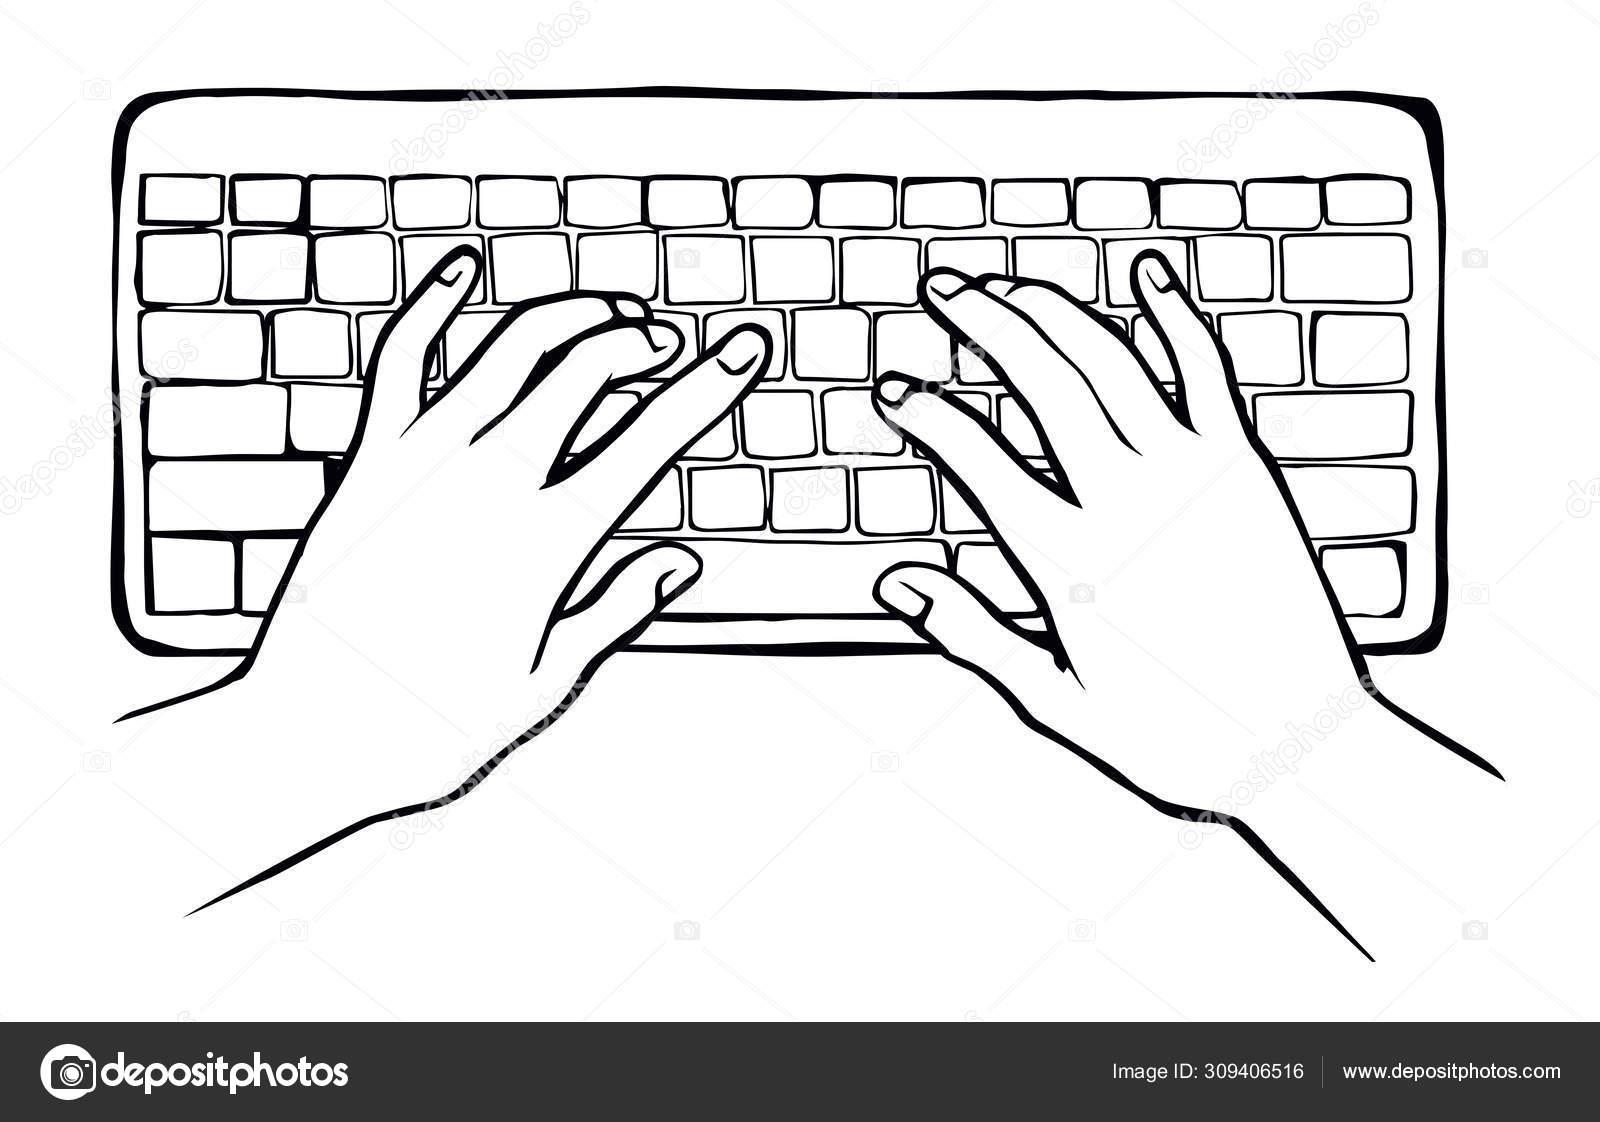 Hands On The Keyboard Vector Drawing Stock Vector C Marinka 309406516